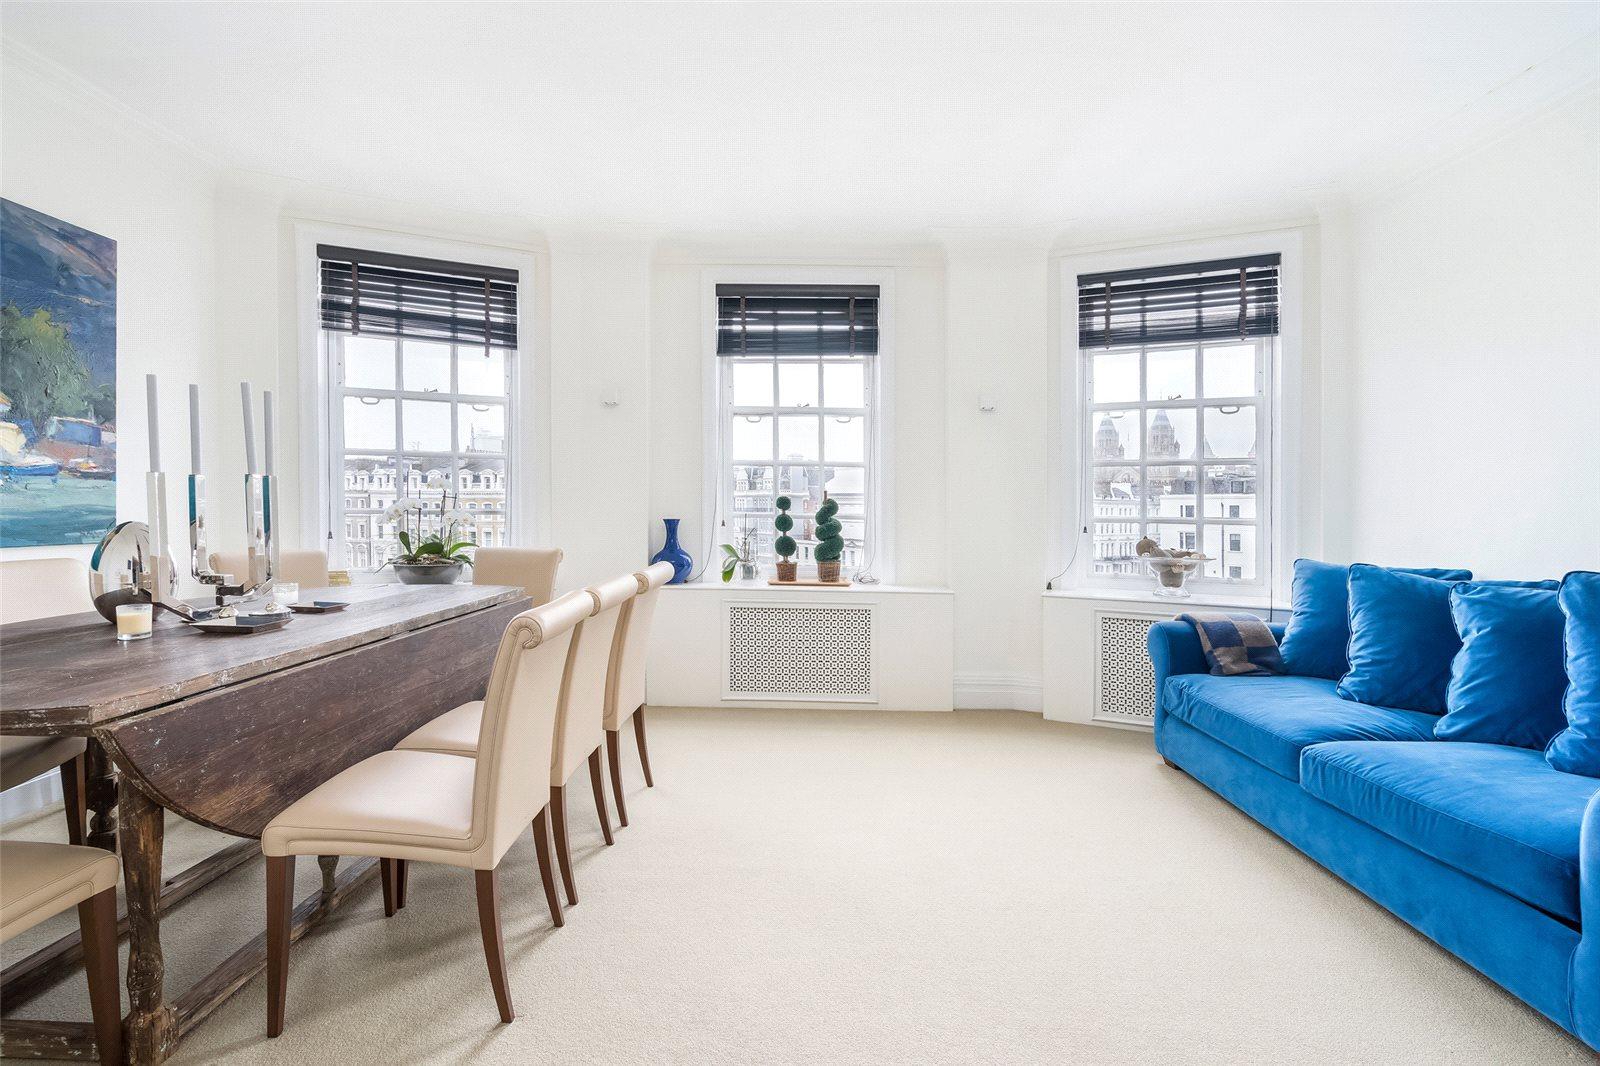 供暖系统 为 出租 在 Malvern Court, Onslow Square, London, SW7 London, 英格兰